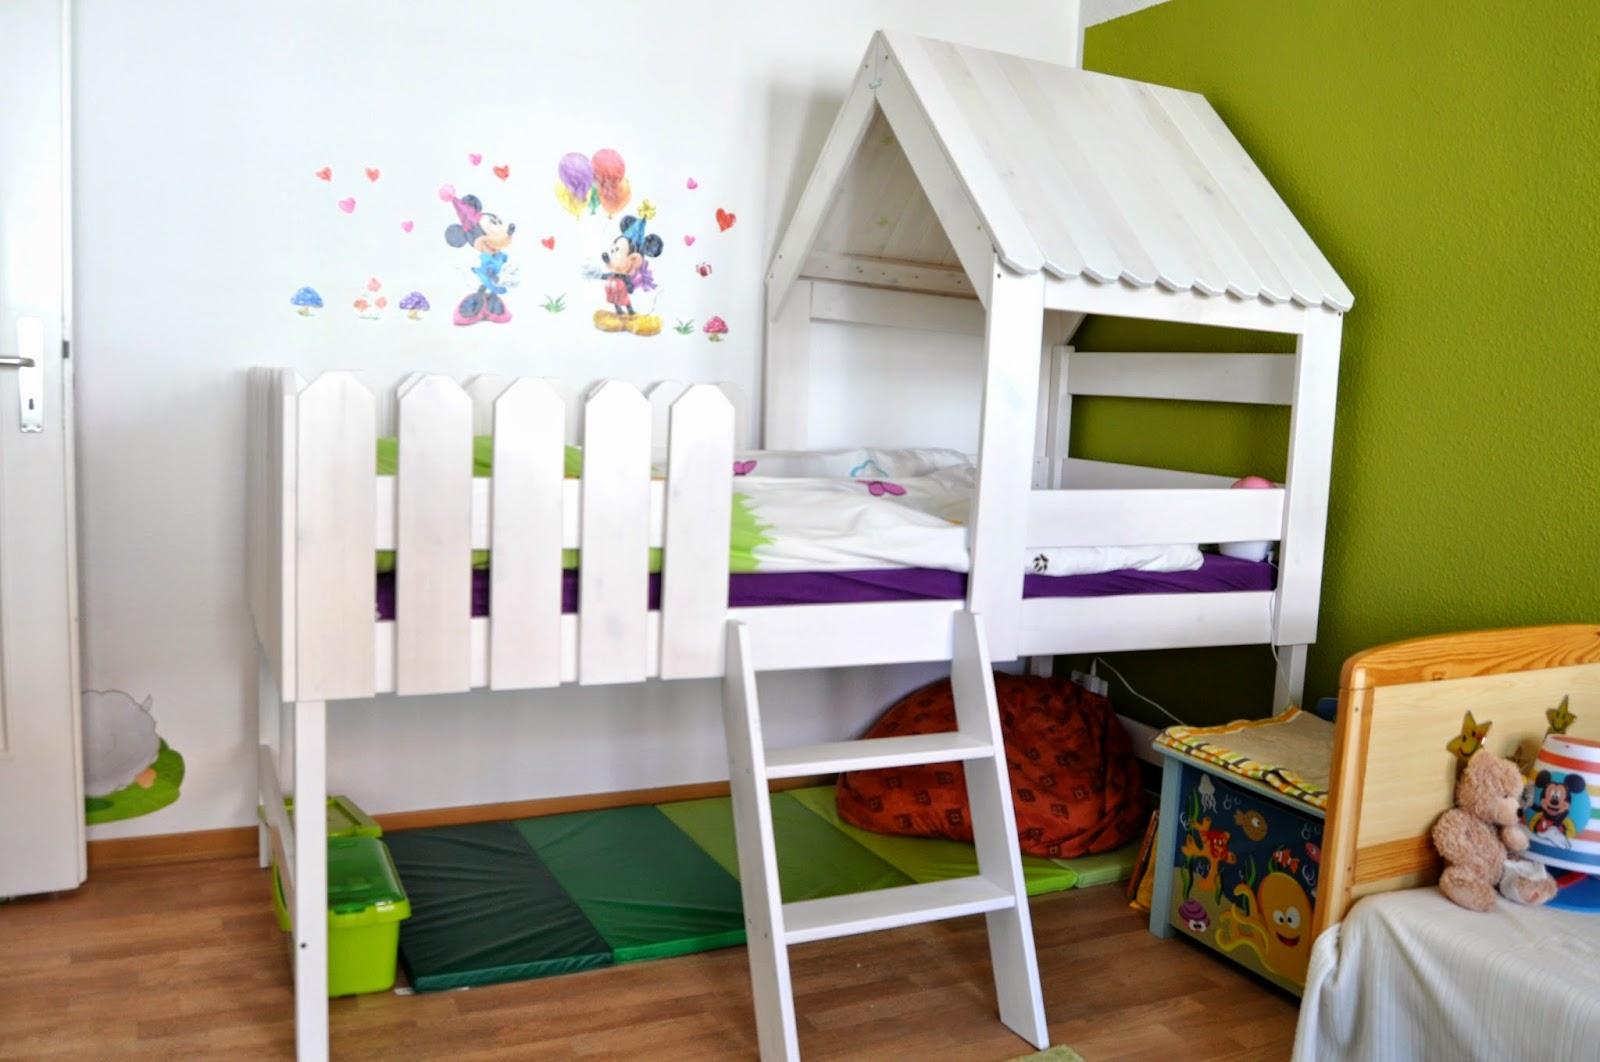 Zeigt Her Eure Kinderzimmer Verflixter Alltag Der Kuriose Mama Blog